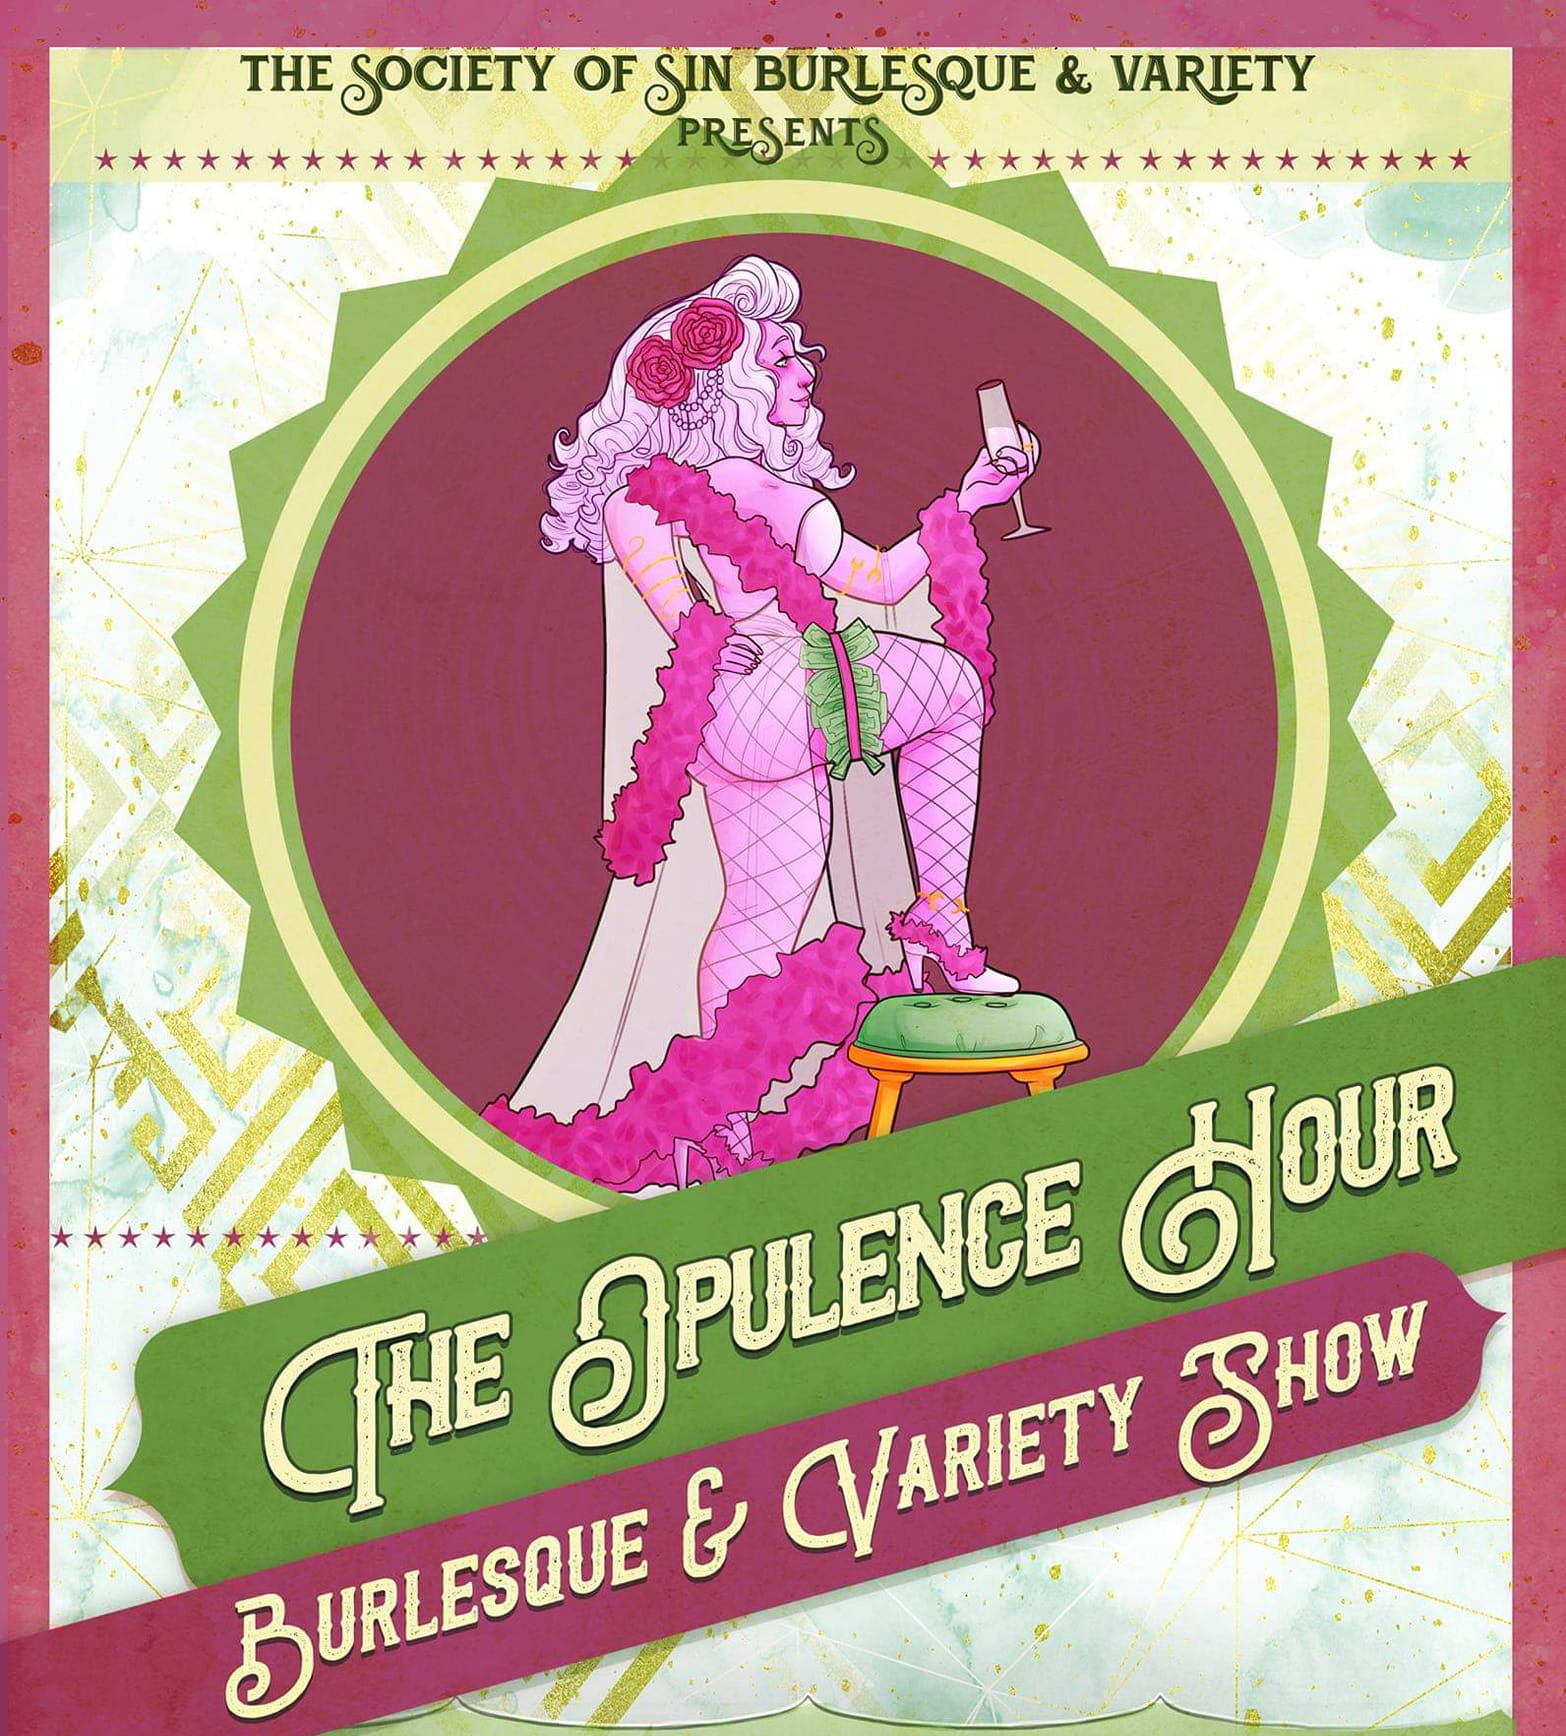 Opulence Hour Burlesque